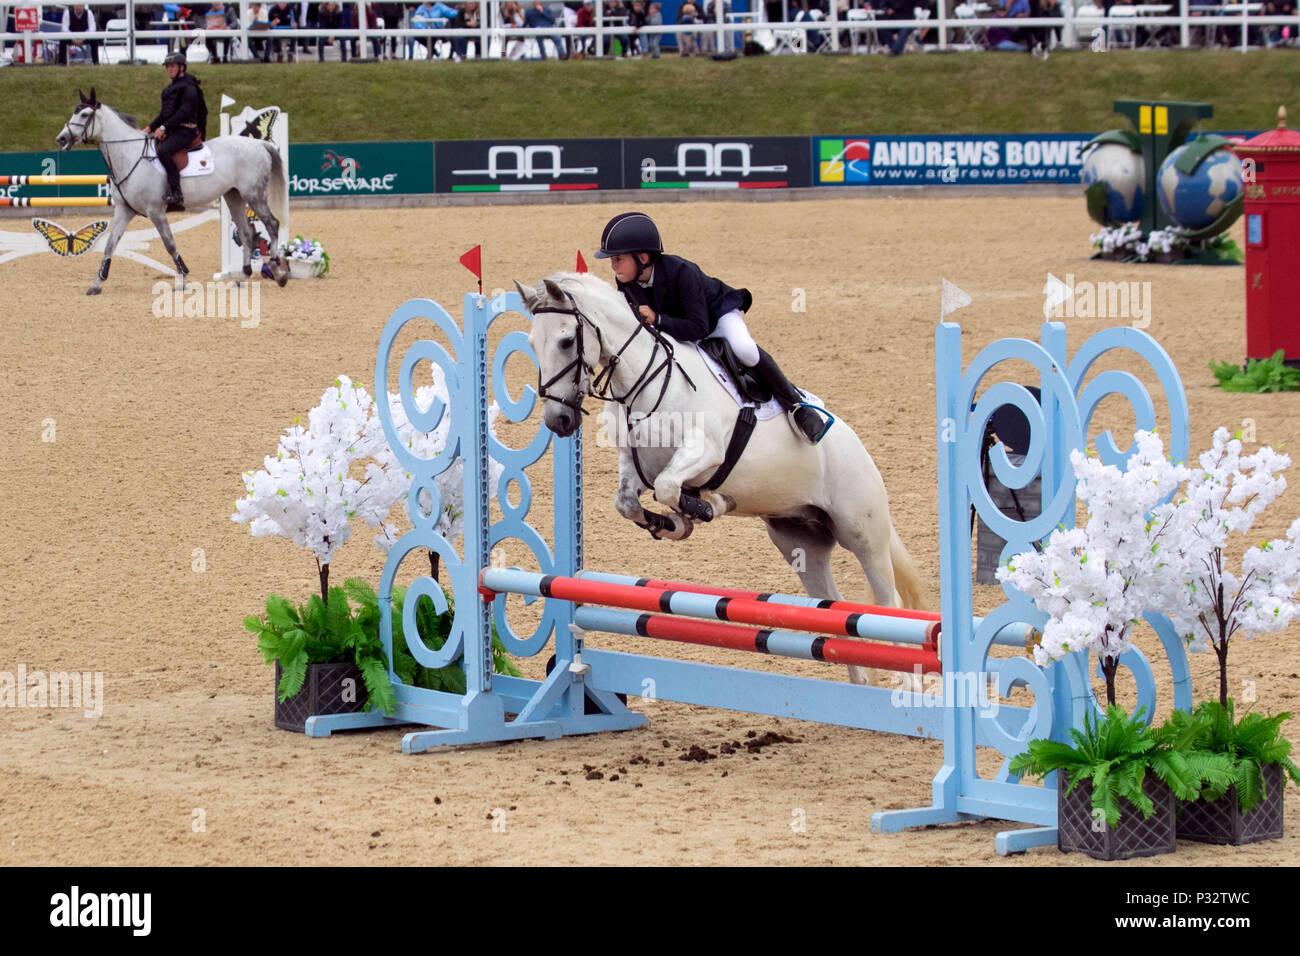 Jack Hewitt Bolesworth, Cheshire. 17/06/2018. Childens show jumping in gara la Invitational Mini relè principali. Credito/MediaWorldImages AlamyLiveNews. Immagini Stock